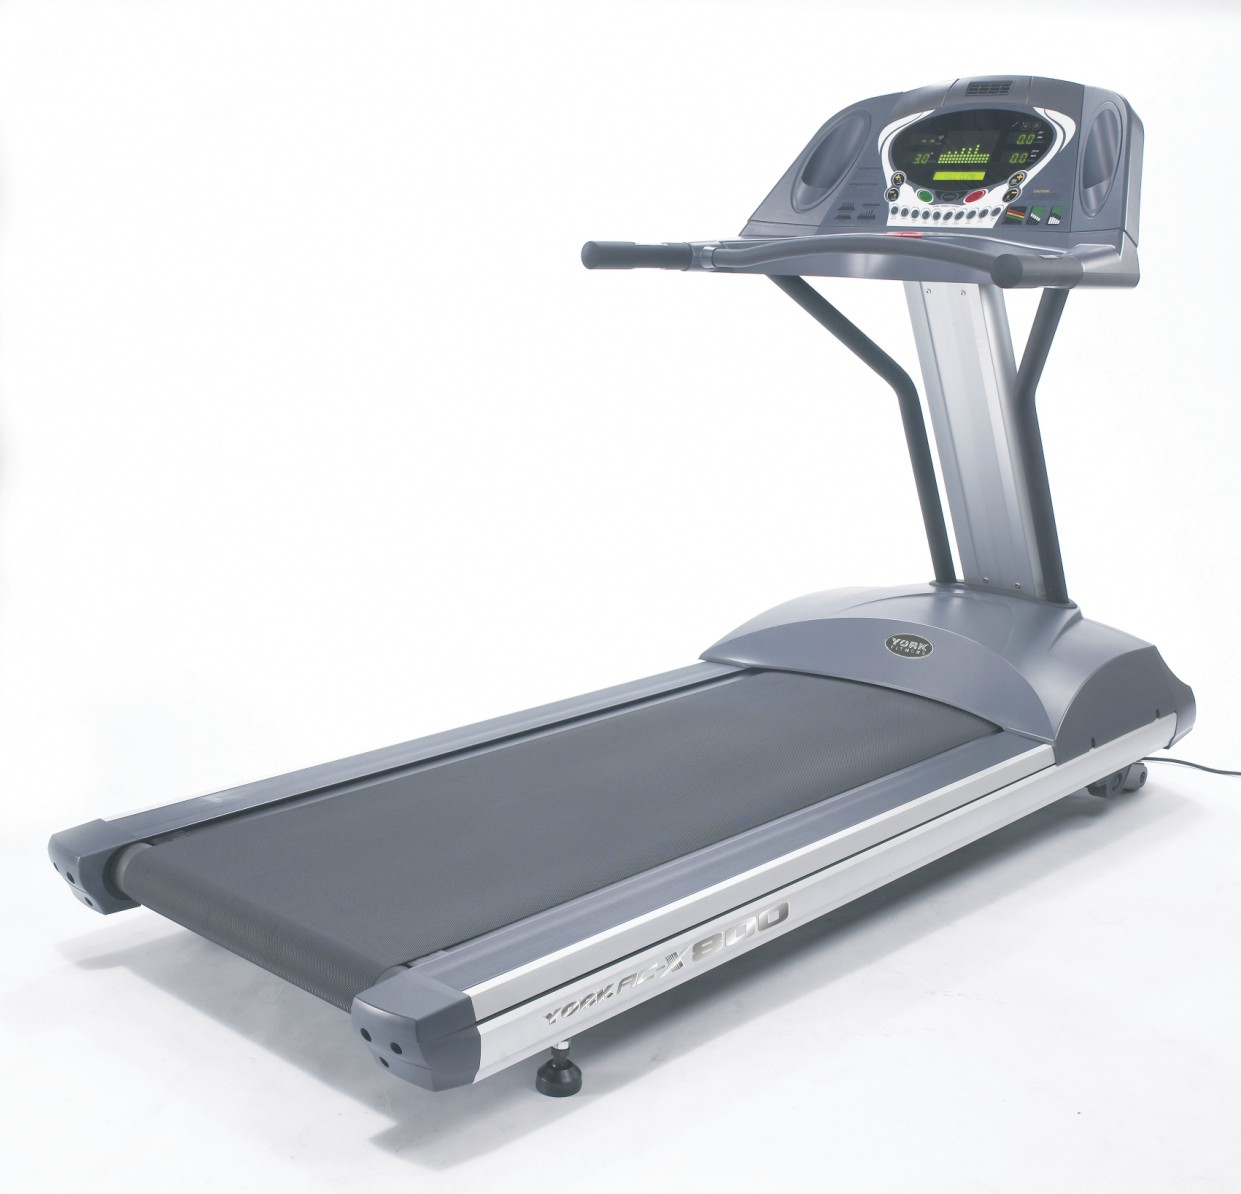 ACX-800 Treadmill | Gym & Fitness Equipment